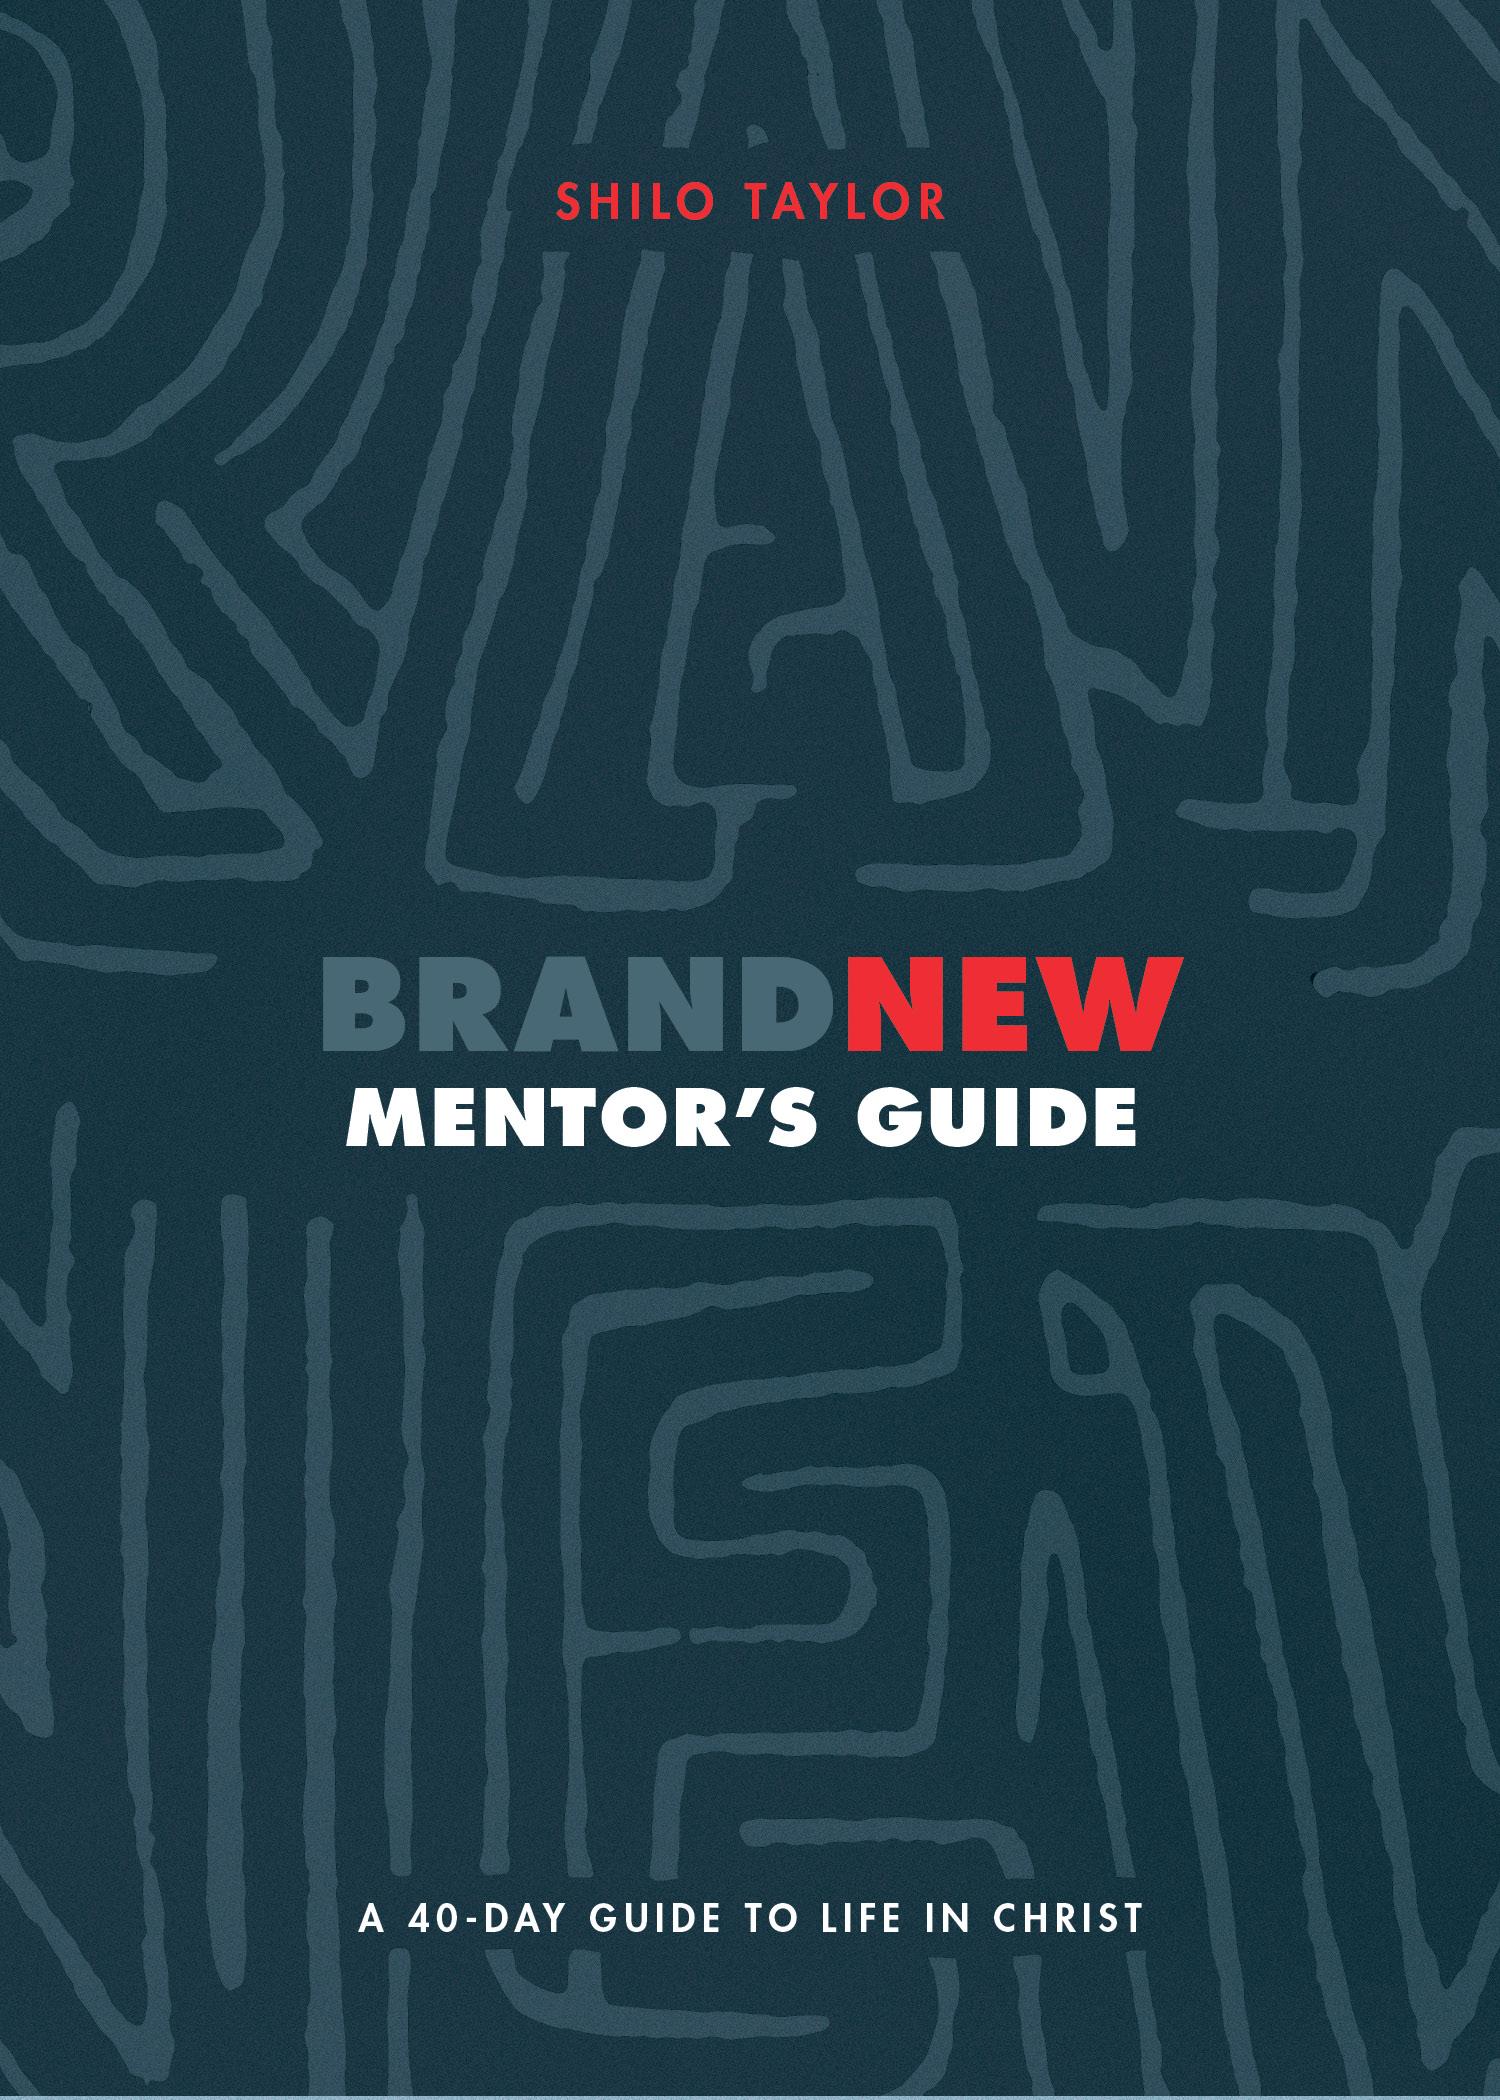 Brand New Mentor's Guide